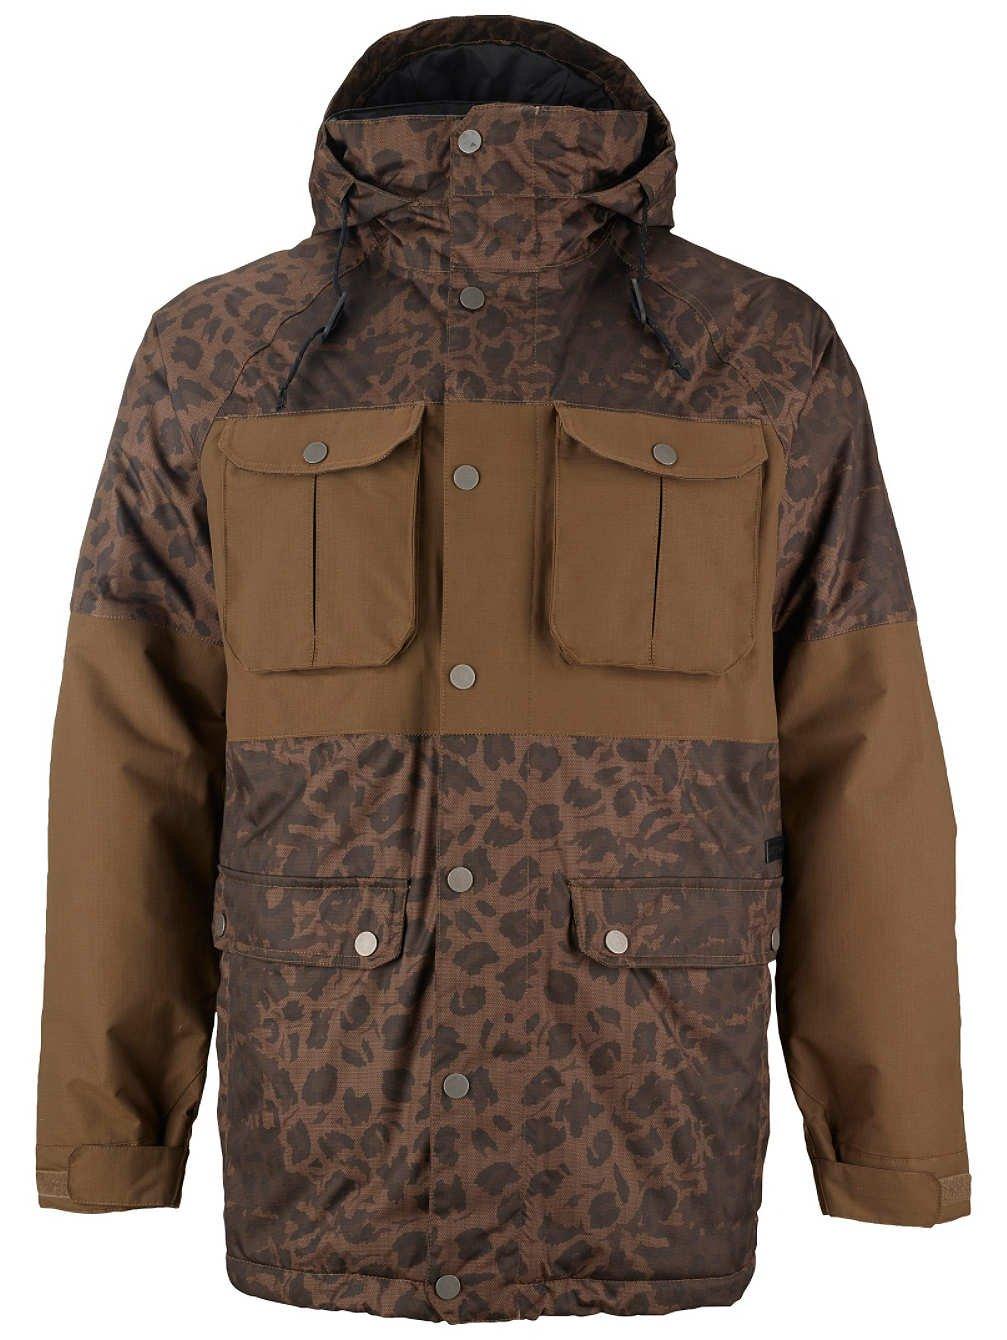 BURTON FRONTIER Jacke 2015 leopard/woody bestellen